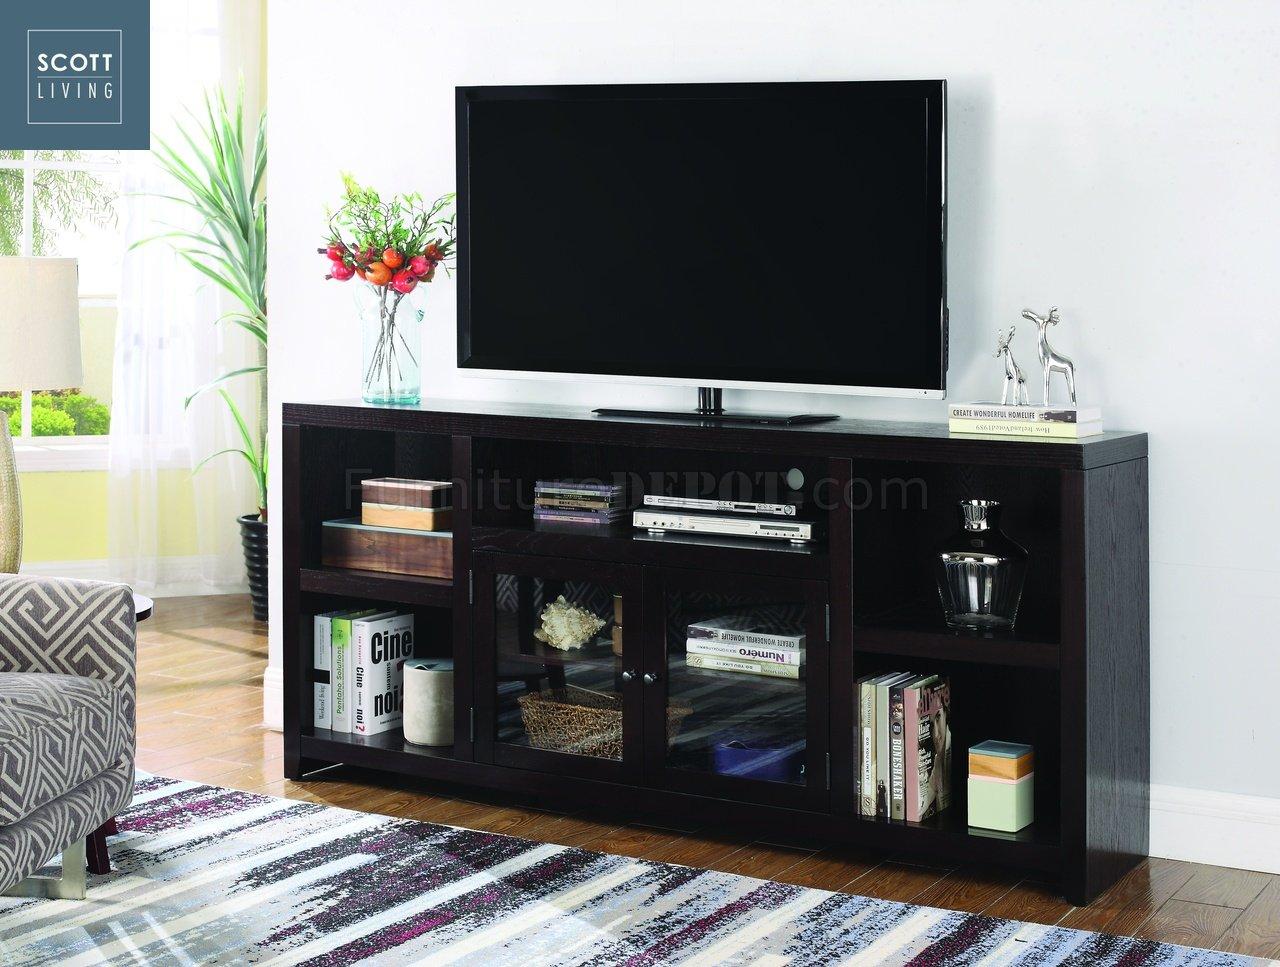 Breckinridge 701036 Scott Living Coaster Tv Stand